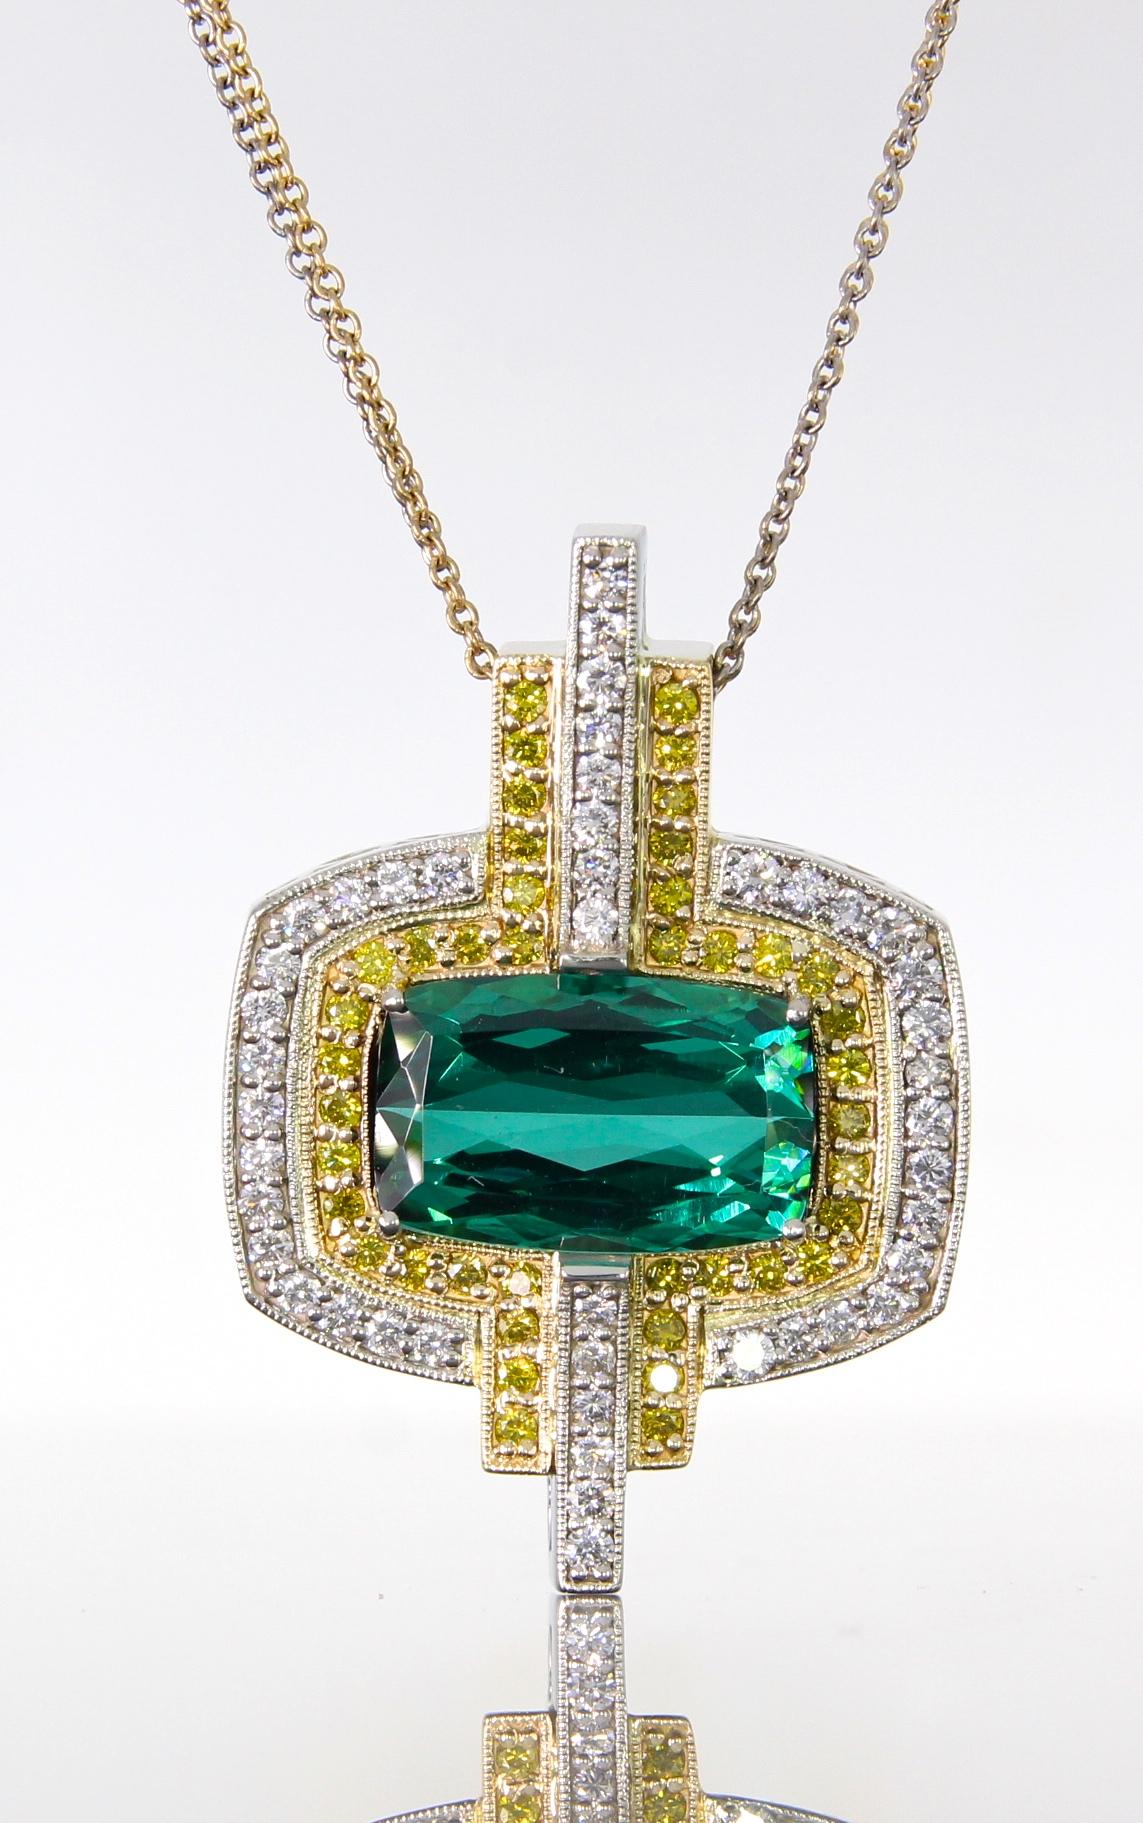 unique-custom-tourmaline-stone-yellow-white-diamonds-art-deco-style-pendant-craft-revival-jewelry-store-grand-rapids